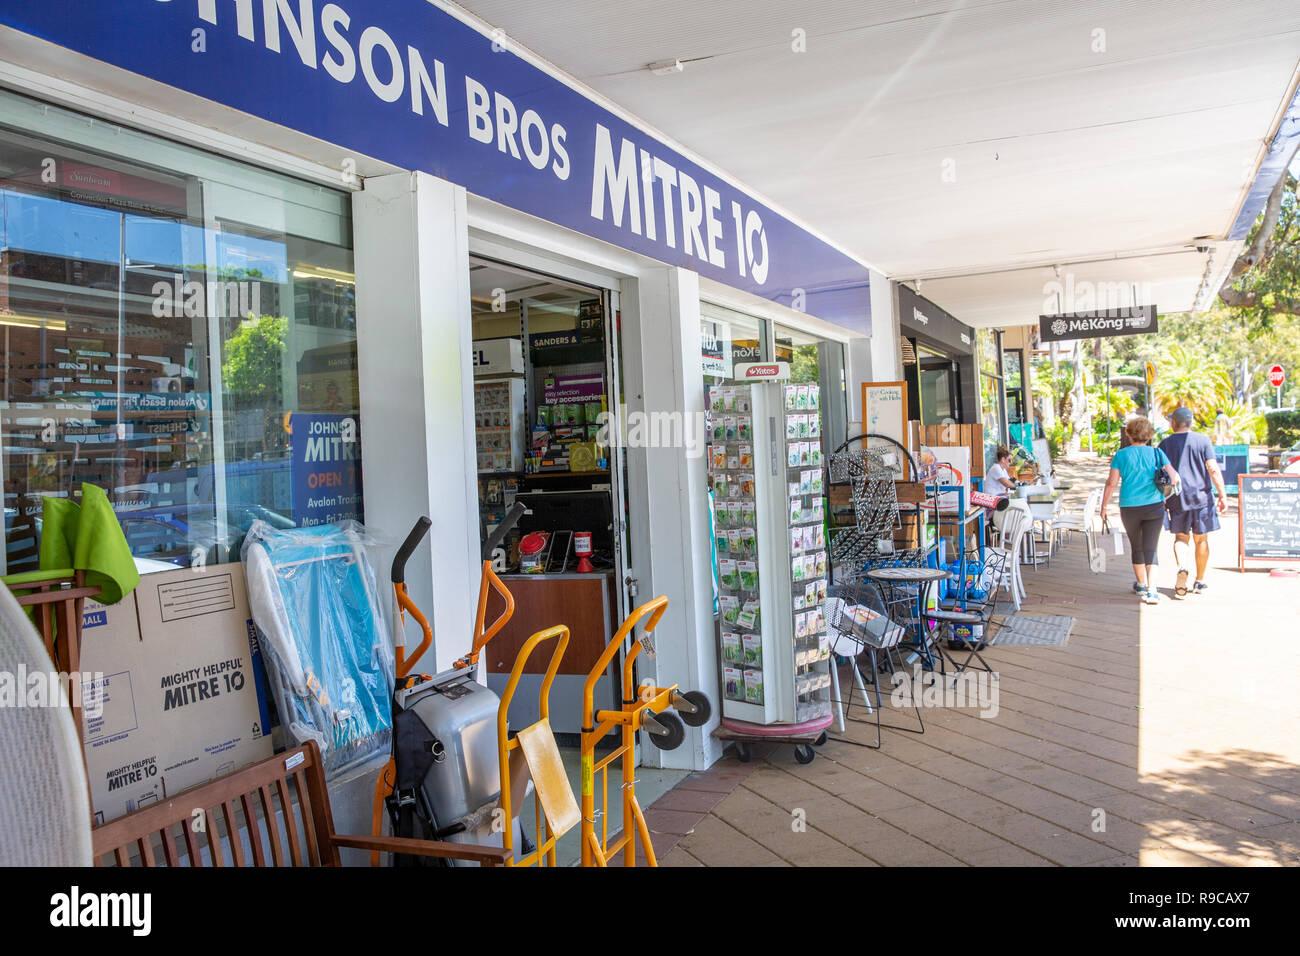 02c9a9d919f Australian hardware store,Mitre 10, in Avalon beach,Sydney,Australia ...